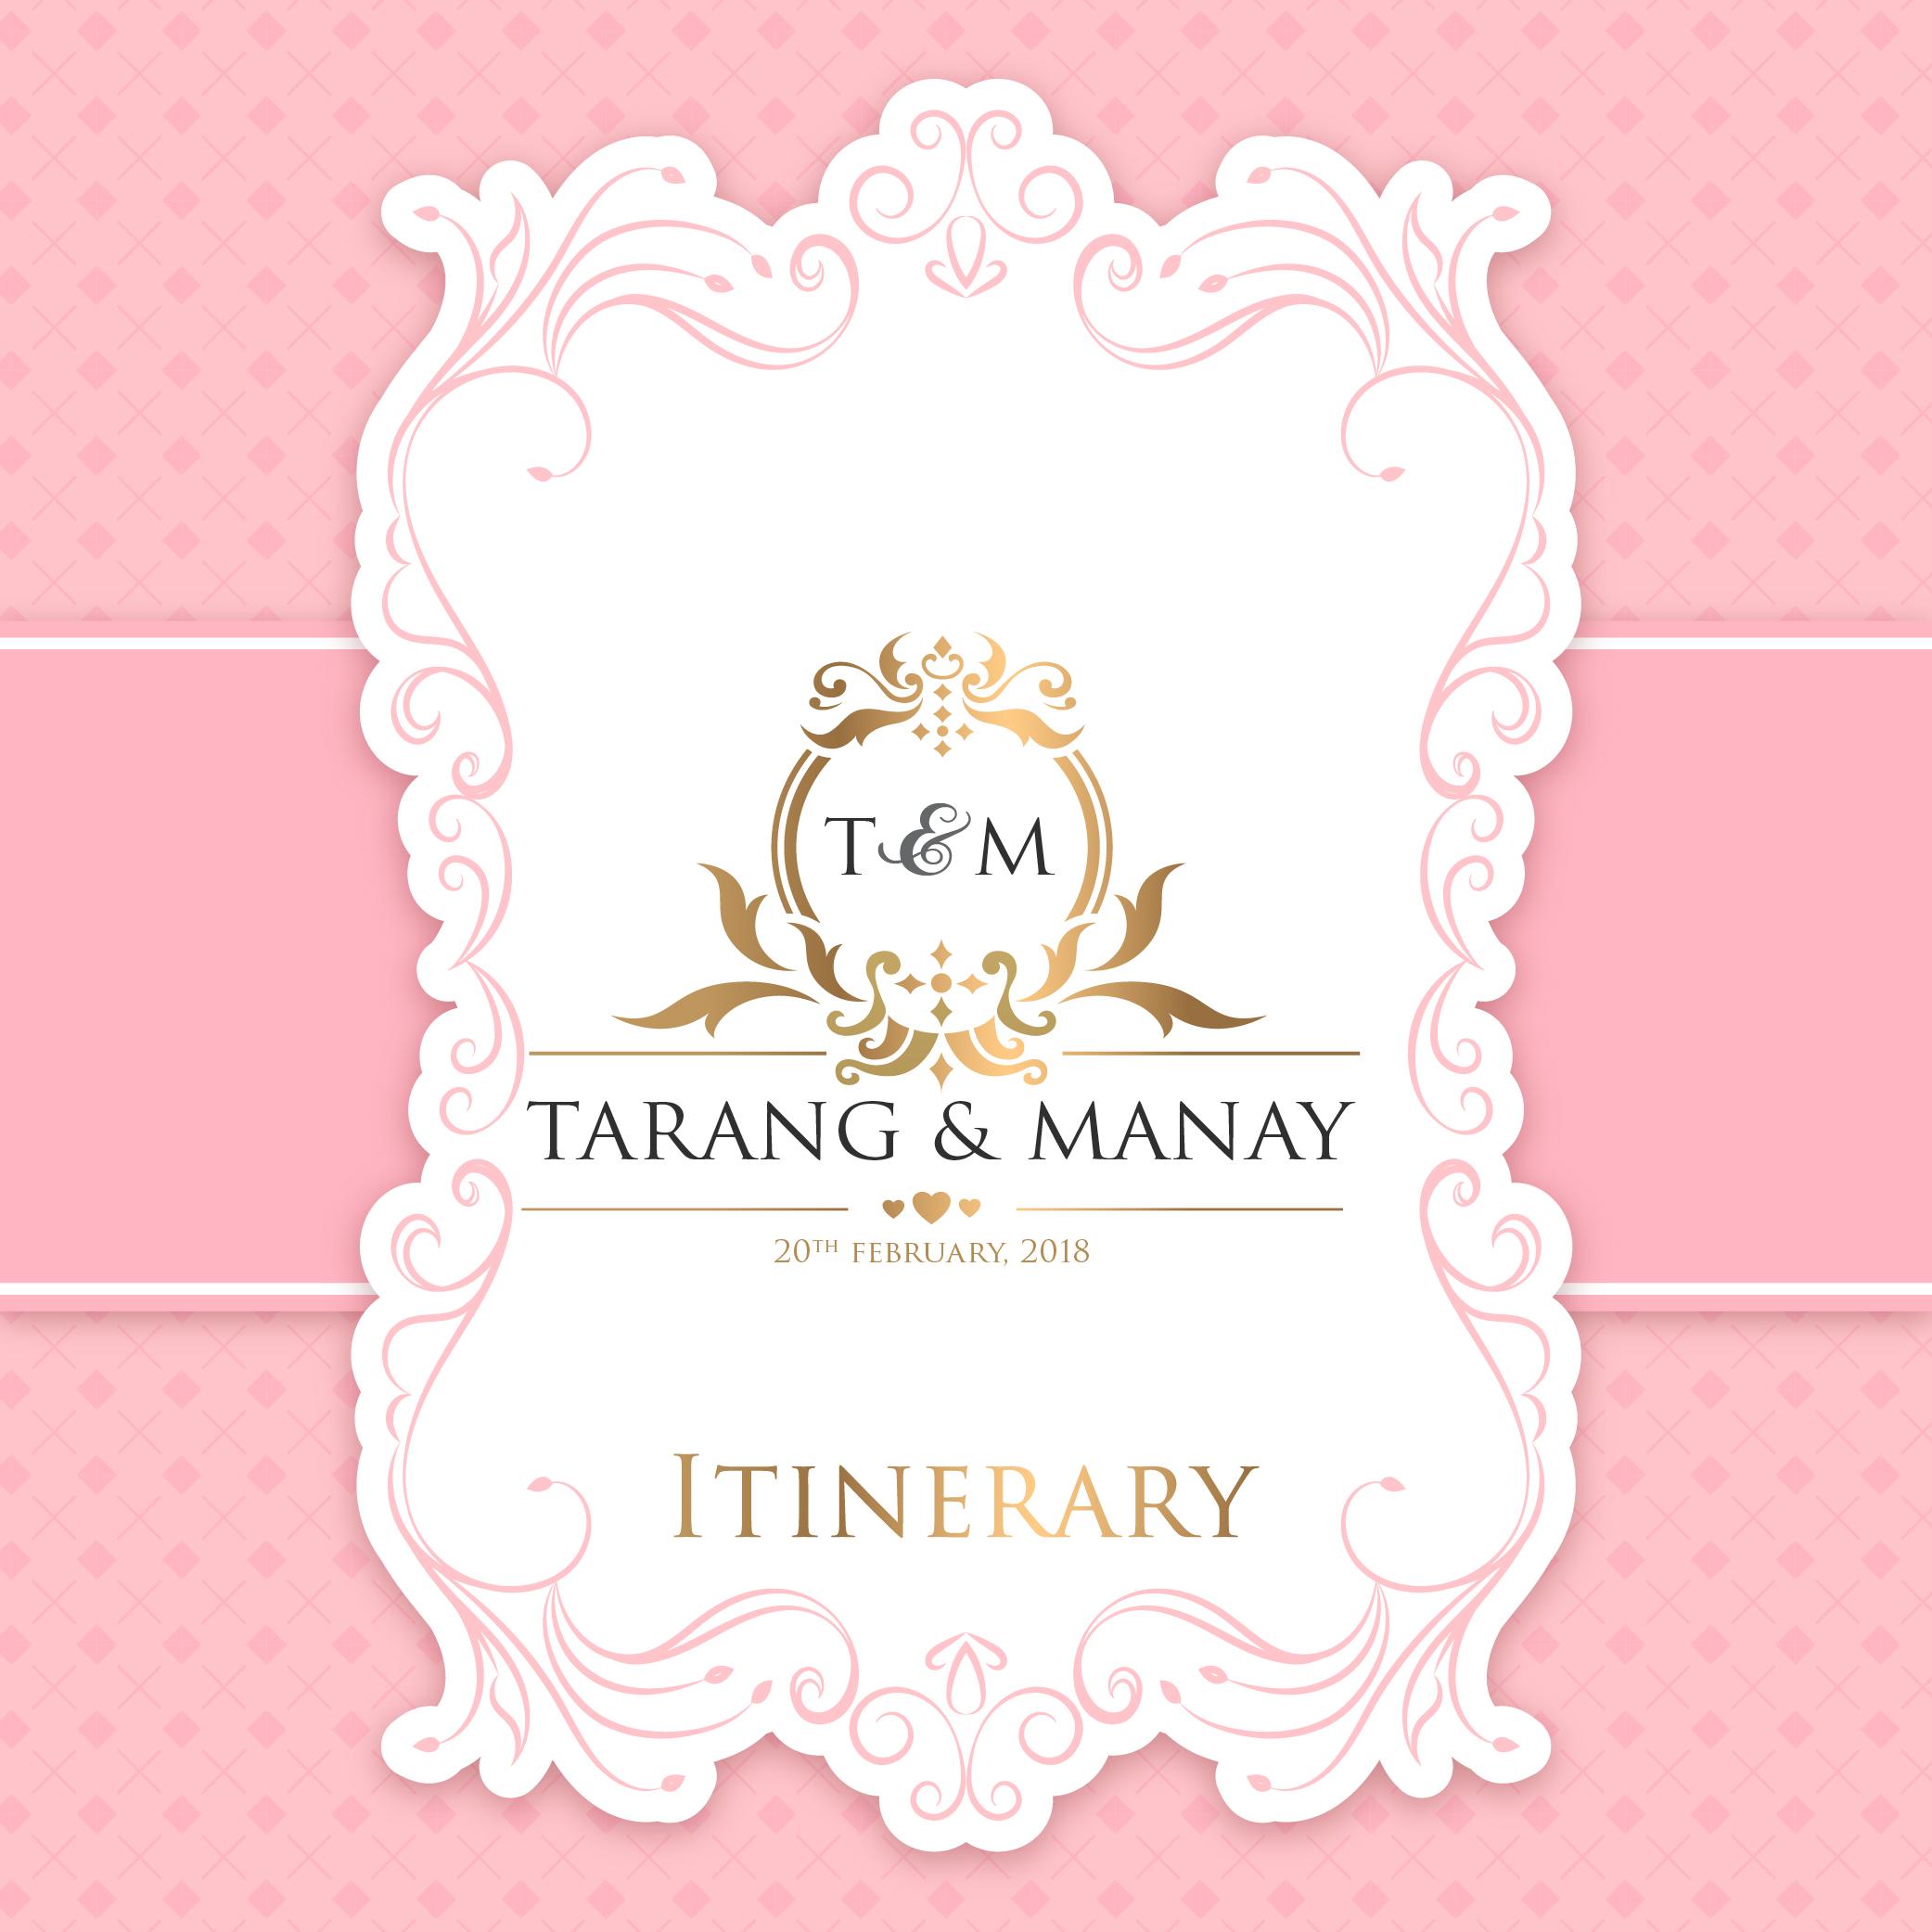 Tarng itiniary 01 - Invitation Card Design Service by Creative Studio